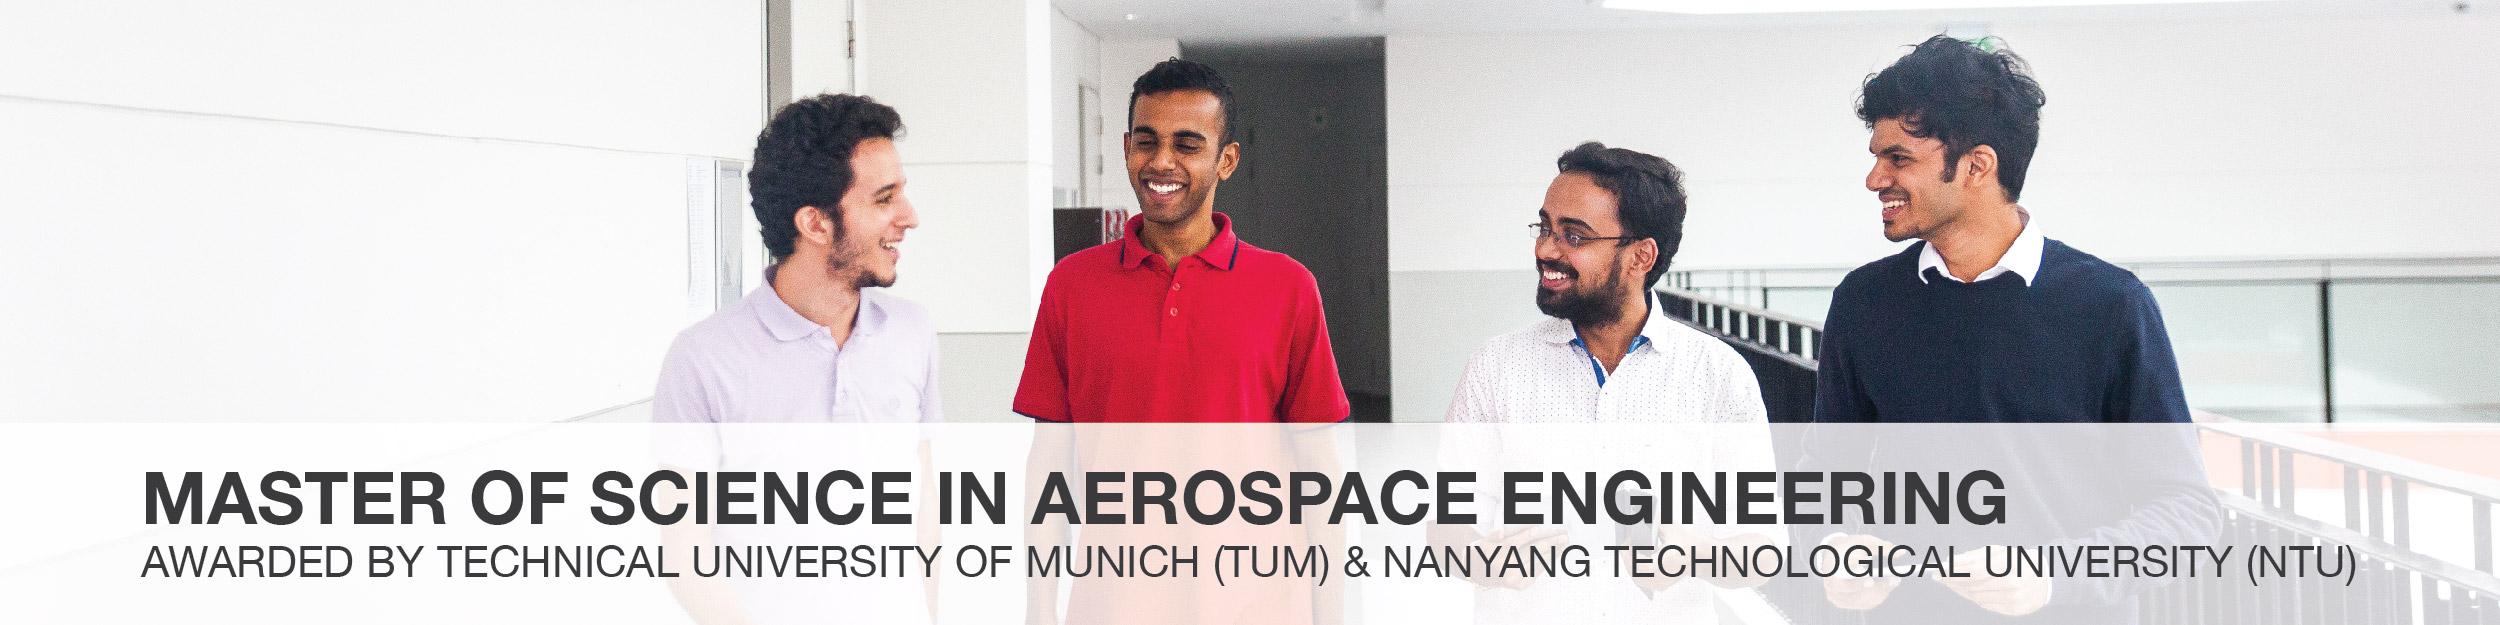 School of Mechanical and Aerospace Engineering